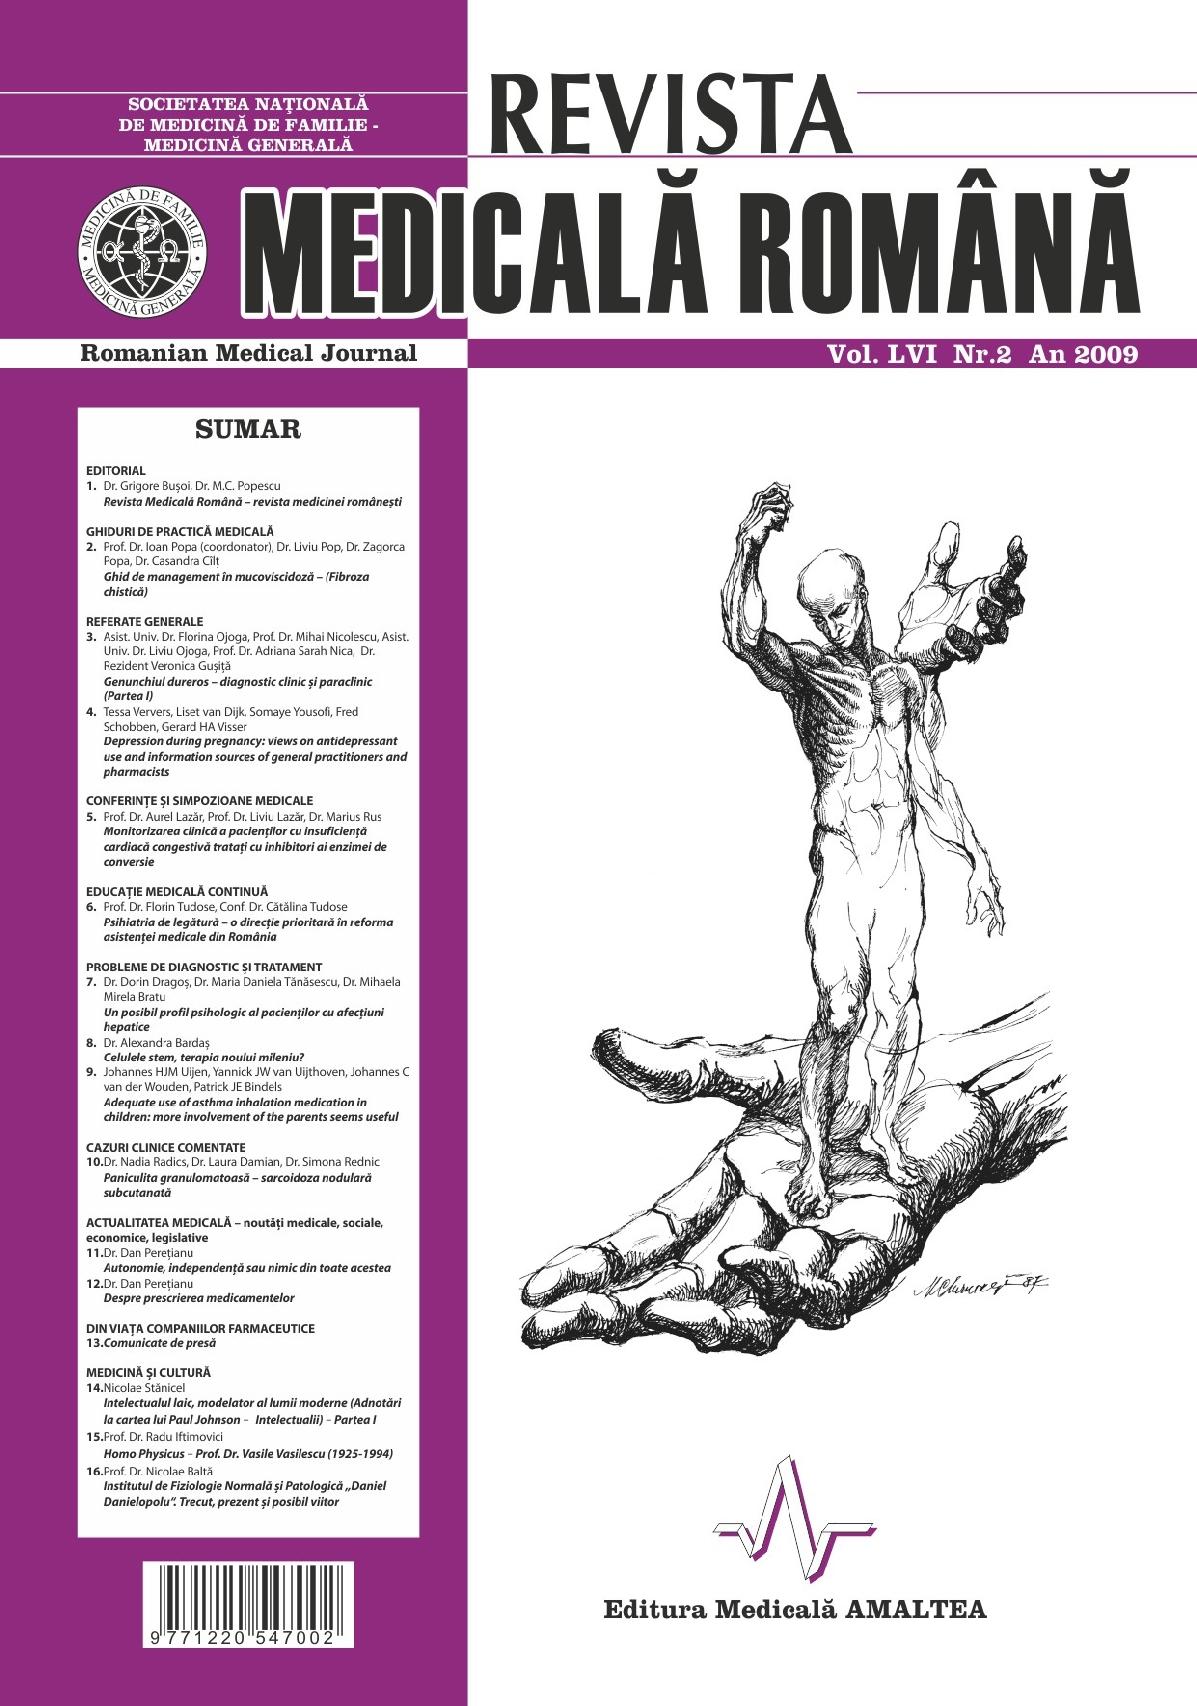 REVISTA MEDICALA ROMANA - Romanian Medical Journal, Vol. LVI, No. 2, Year 2009